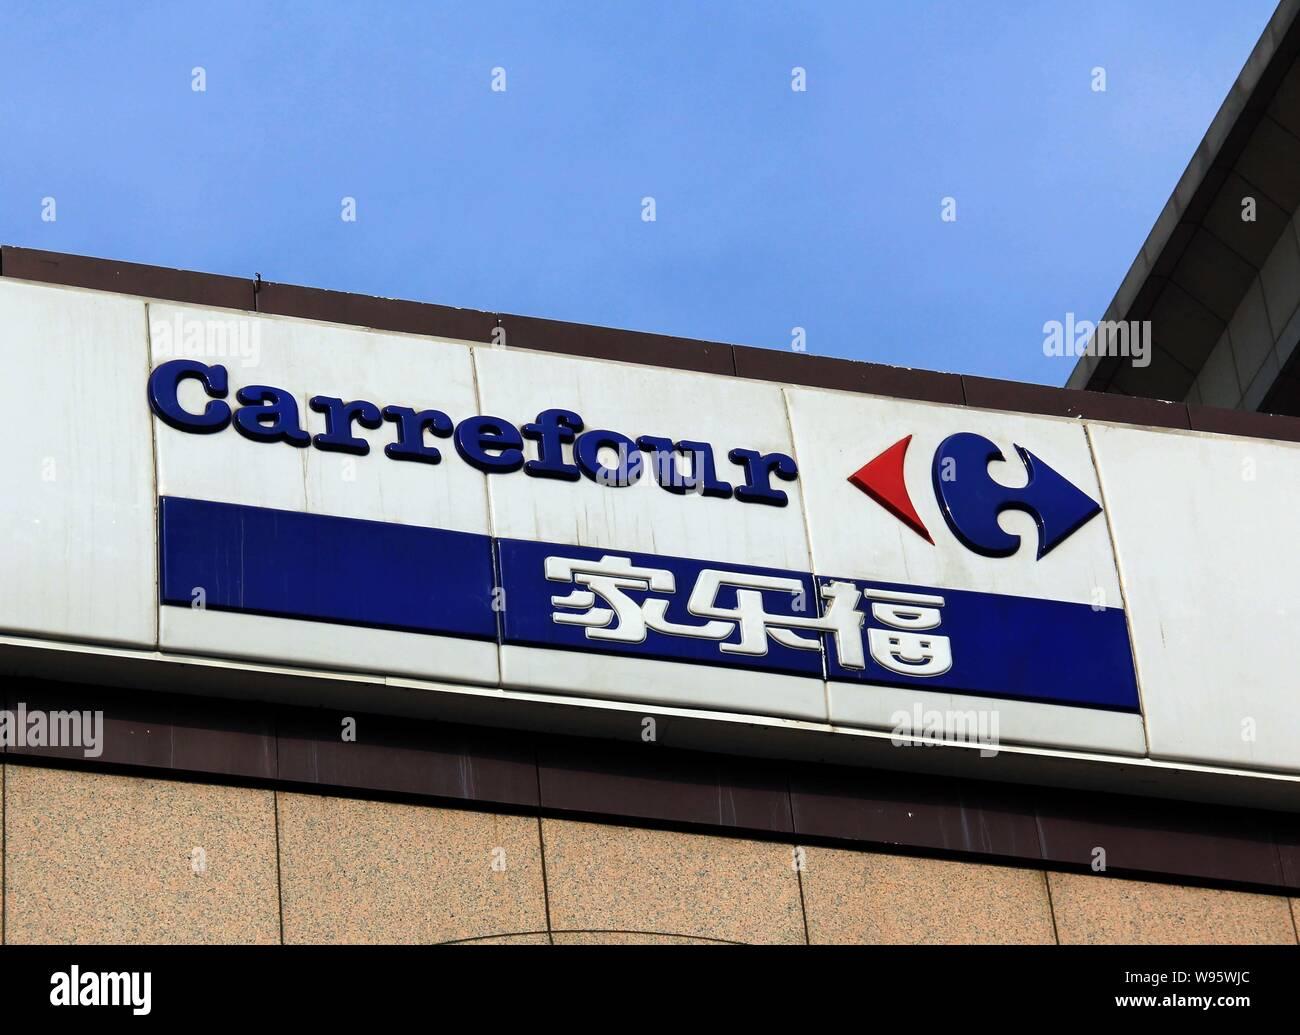 Carrefour Supermarket Stock Photos Carrefour Supermarket